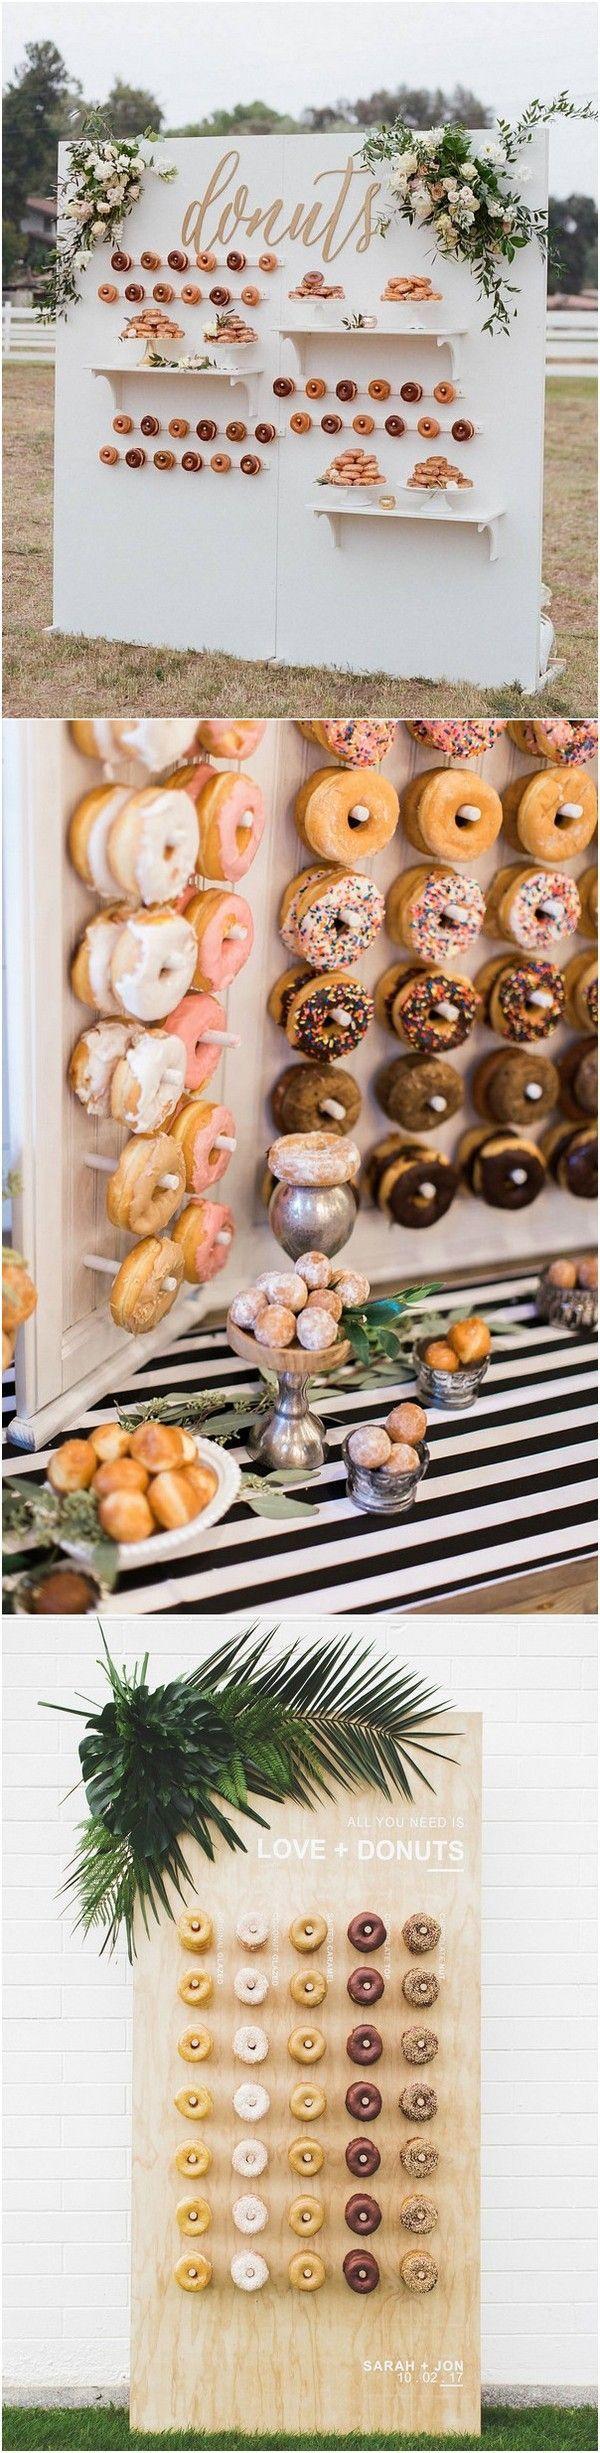 chic outdoor wedding donut wall backdrop ideas